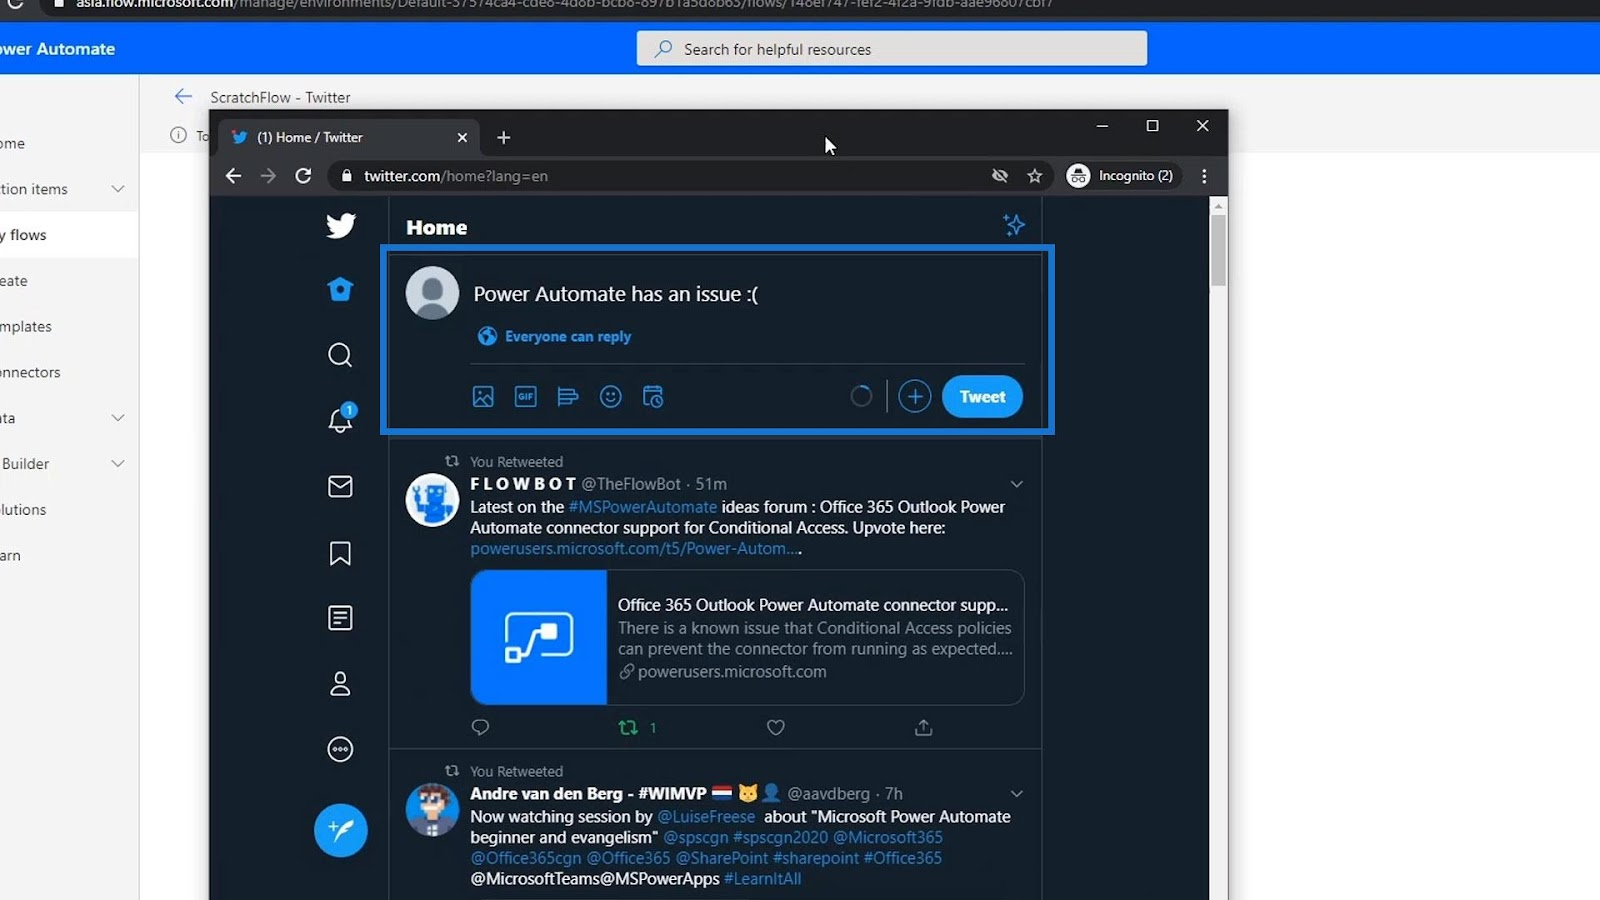 C:\Users\Gel\AppData\Local\Microsoft\Windows\INetCache\Content.Word\2.jpg